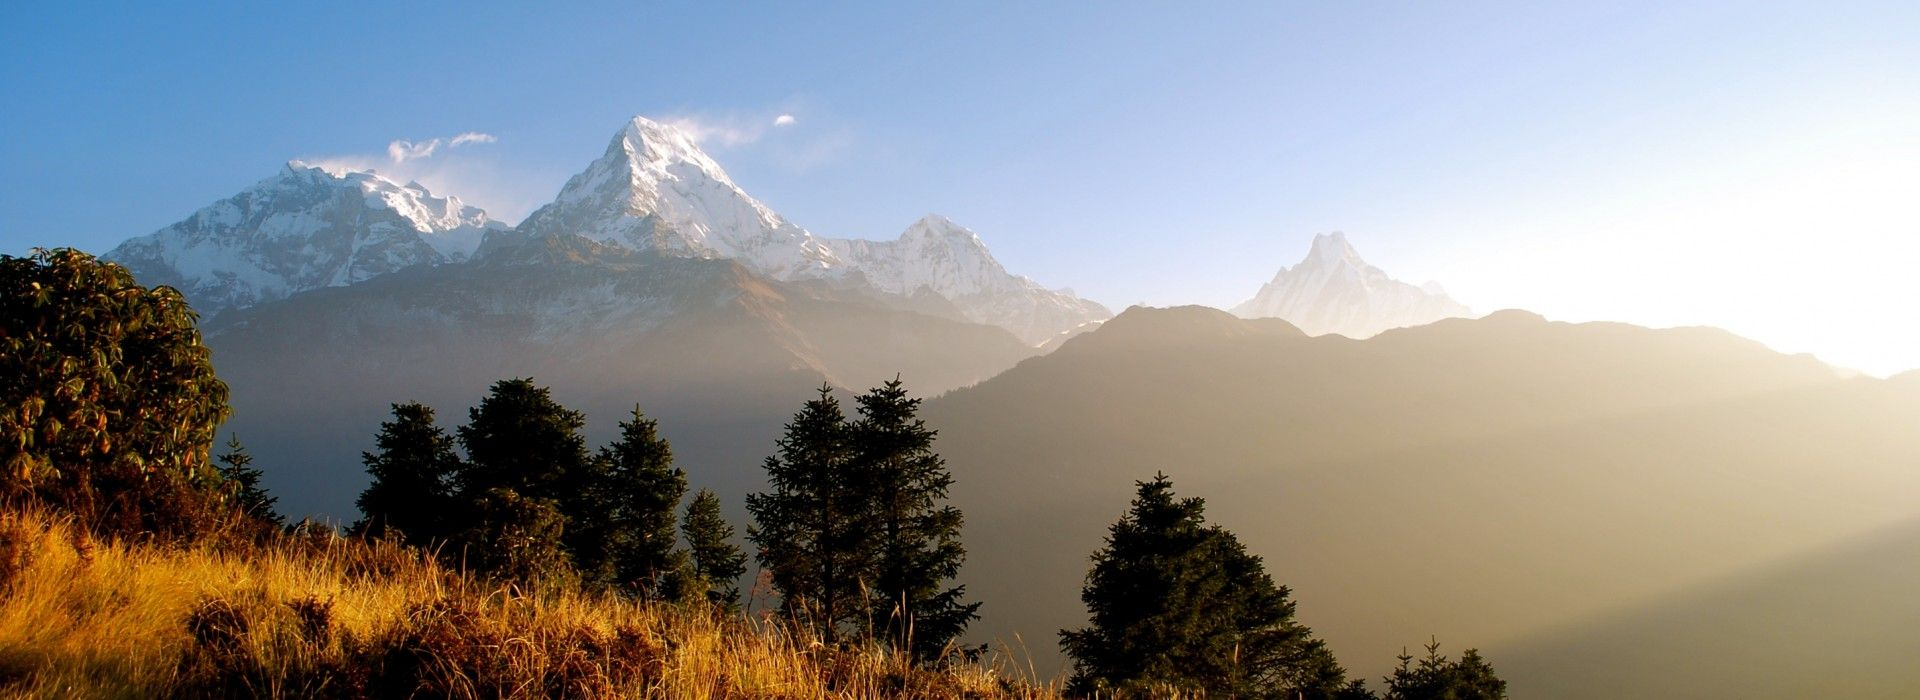 Walking tours in Annapurna Region